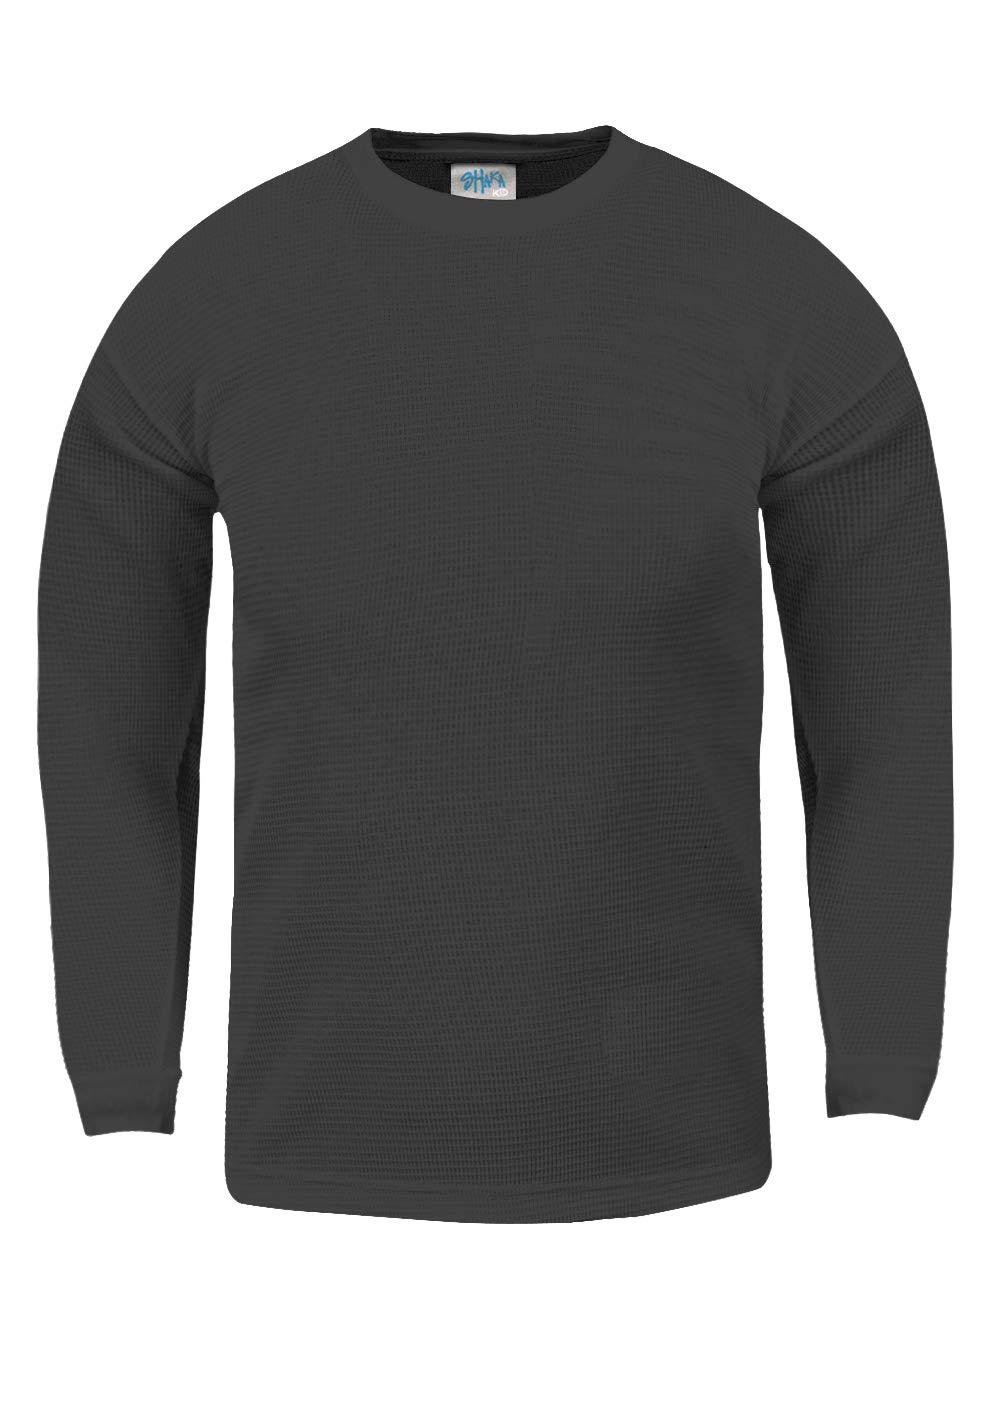 Shaka Wear KTC21_XS Thermal Long Sleeve Crewneck Waffle Shirt C.Grey XS by Shaka Wear